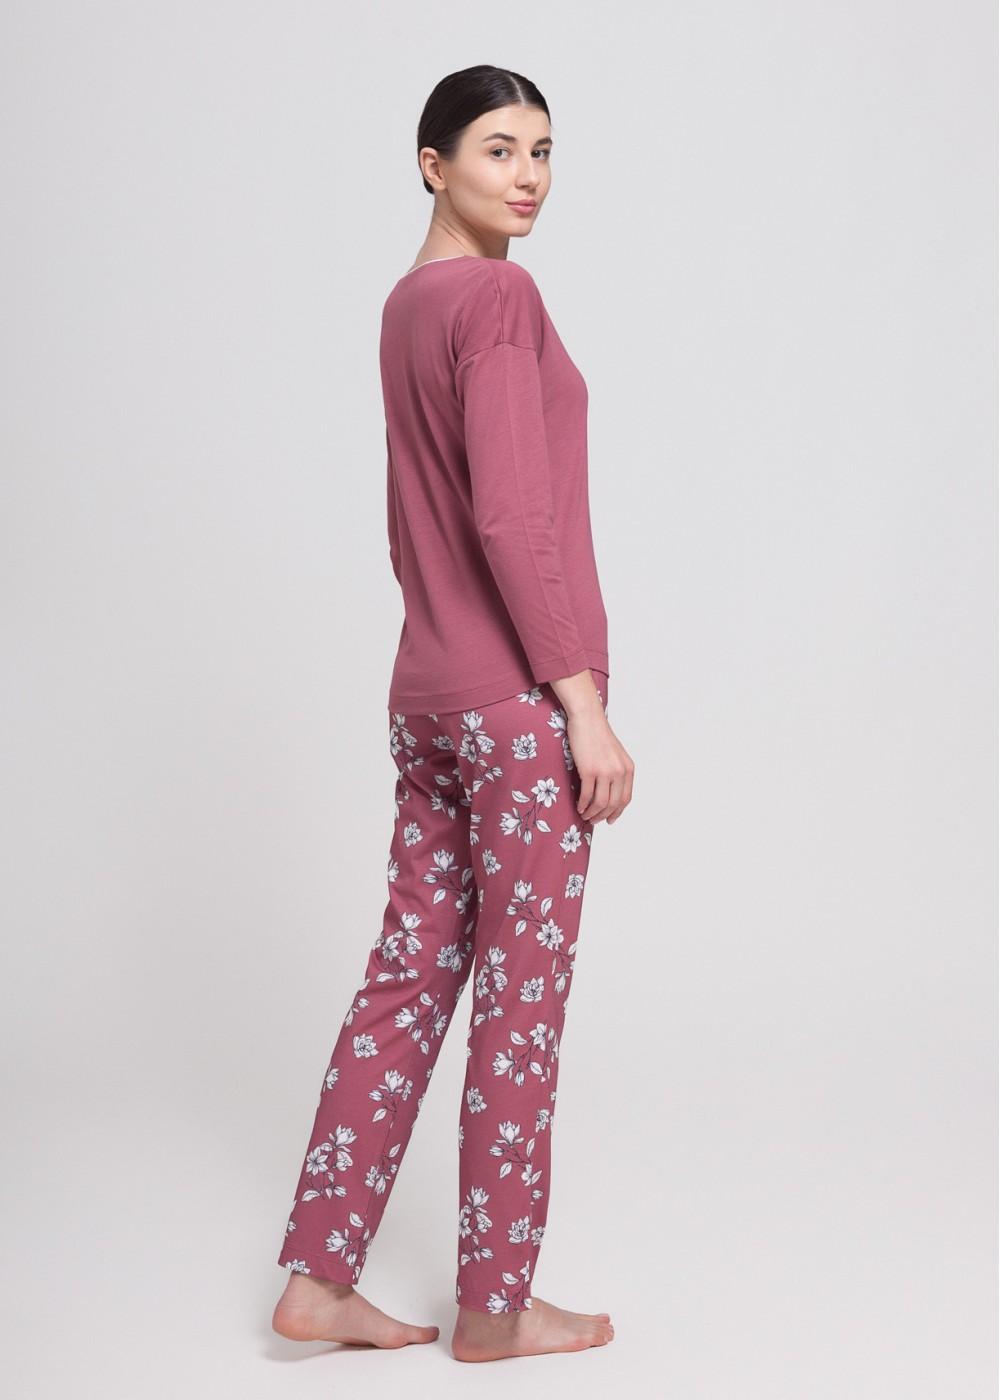 Pijama Magnolia - Modal